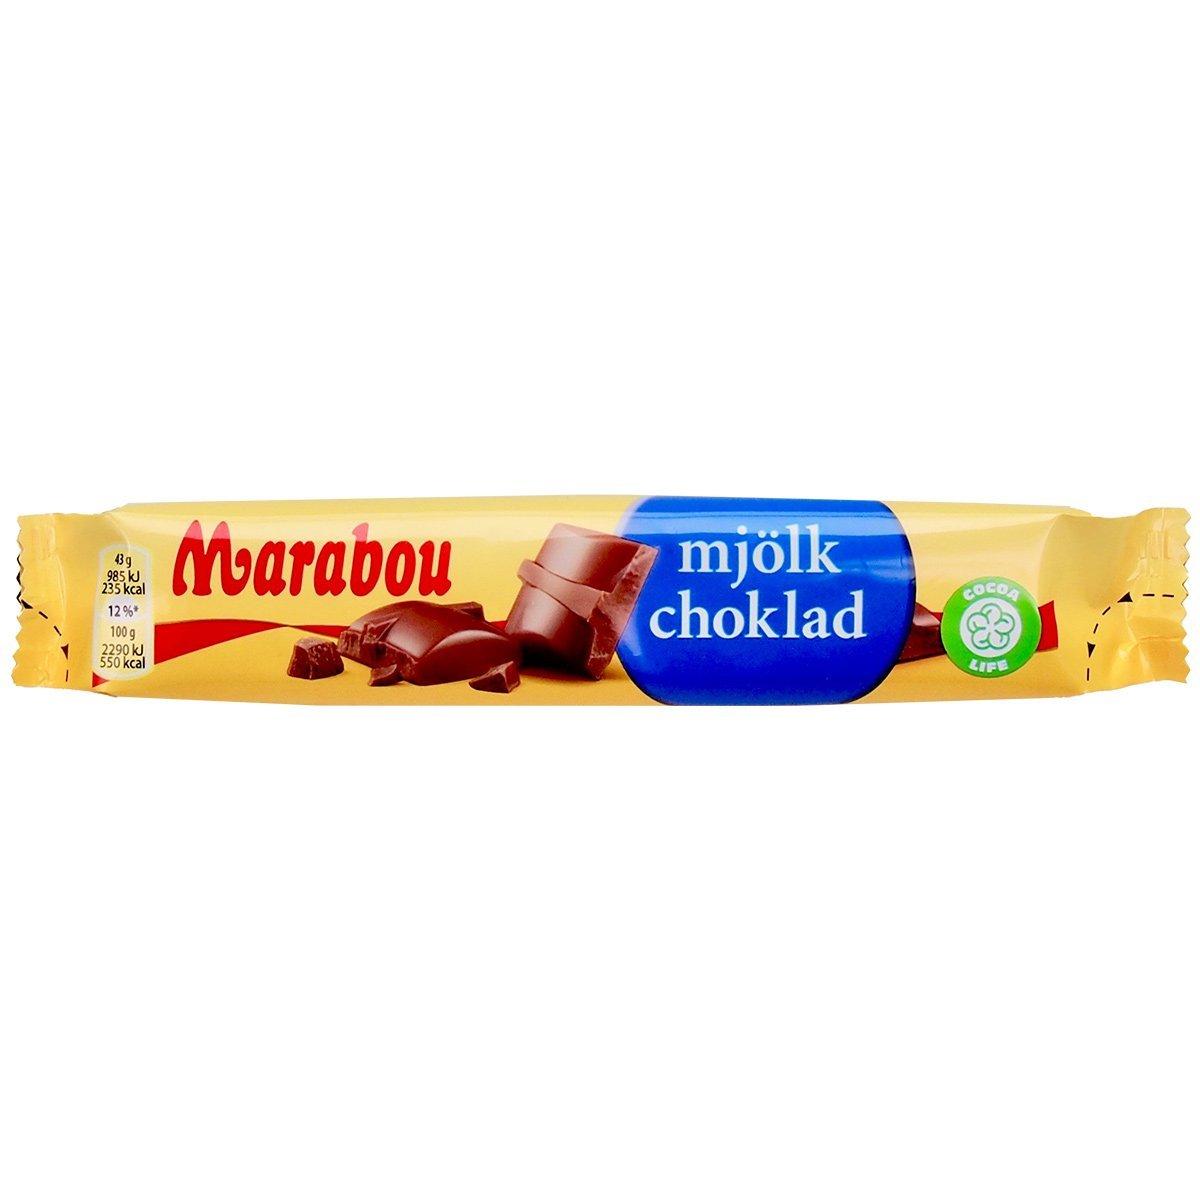 Marabou mjölkchoklad Riegel – Milchschokolade (43g) 1